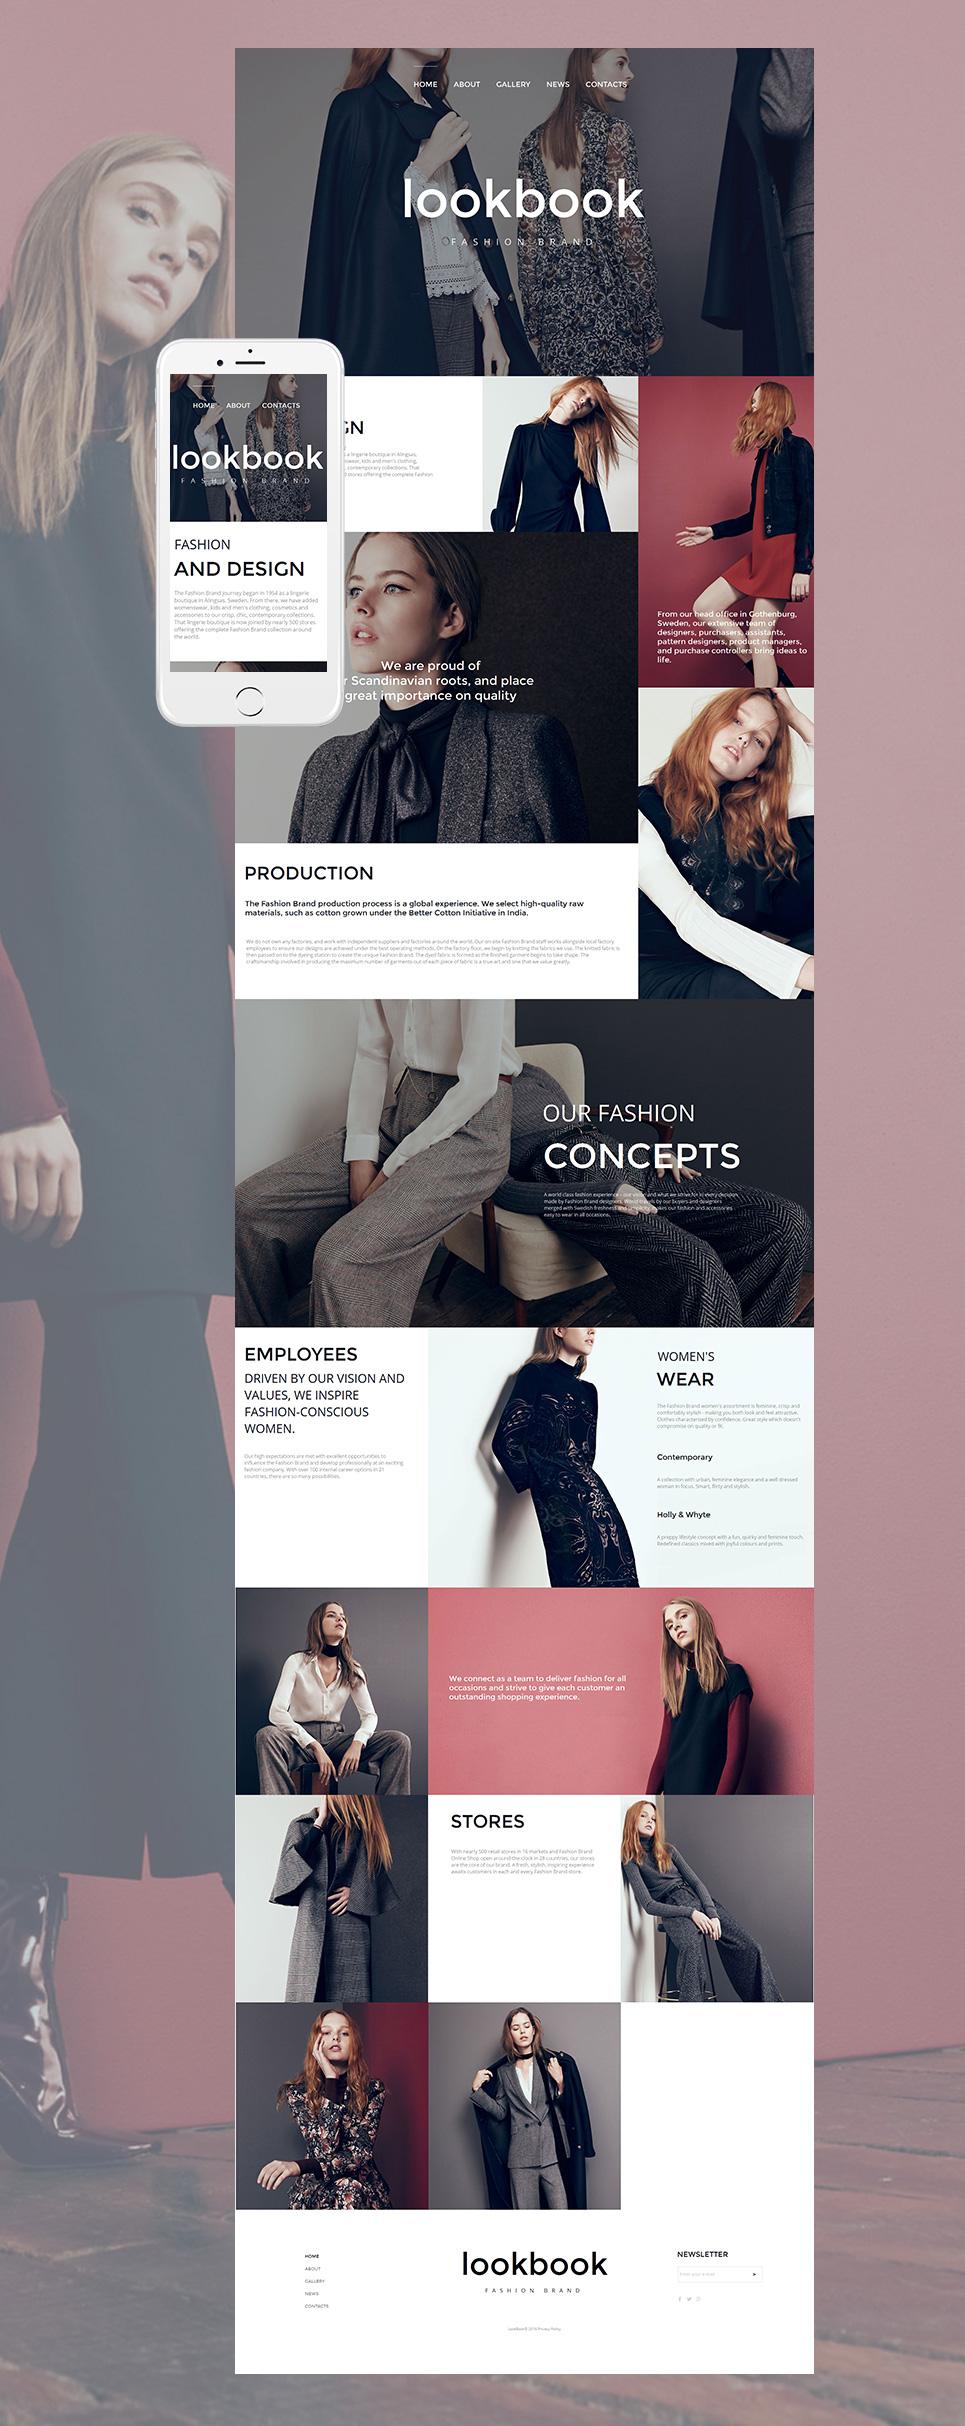 Fashion MotoCMS HTML Template #58745 - image